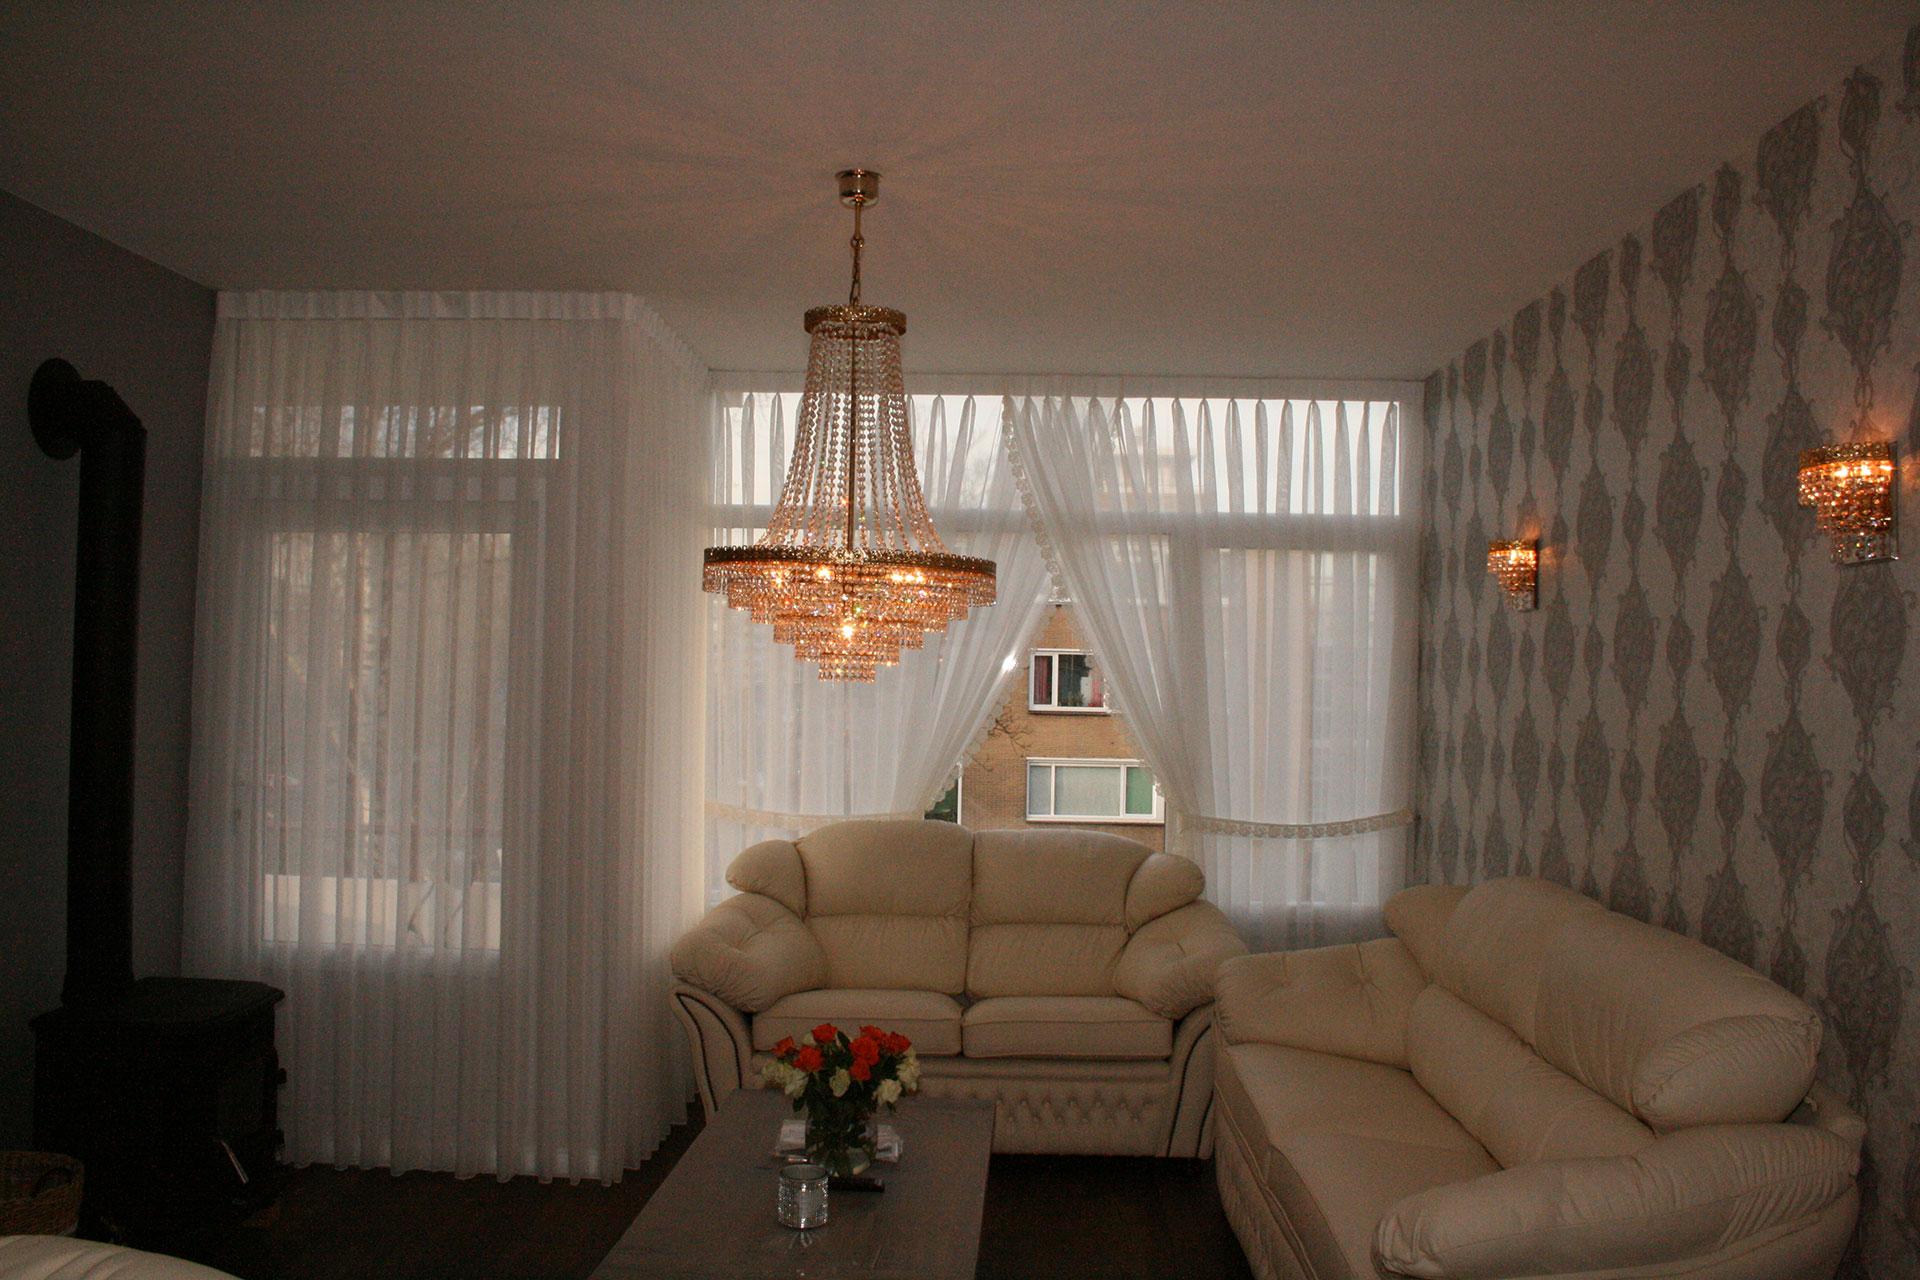 Vitrages wesley 39 s deco interieurstoffen - Deco kamer onder dekking ...